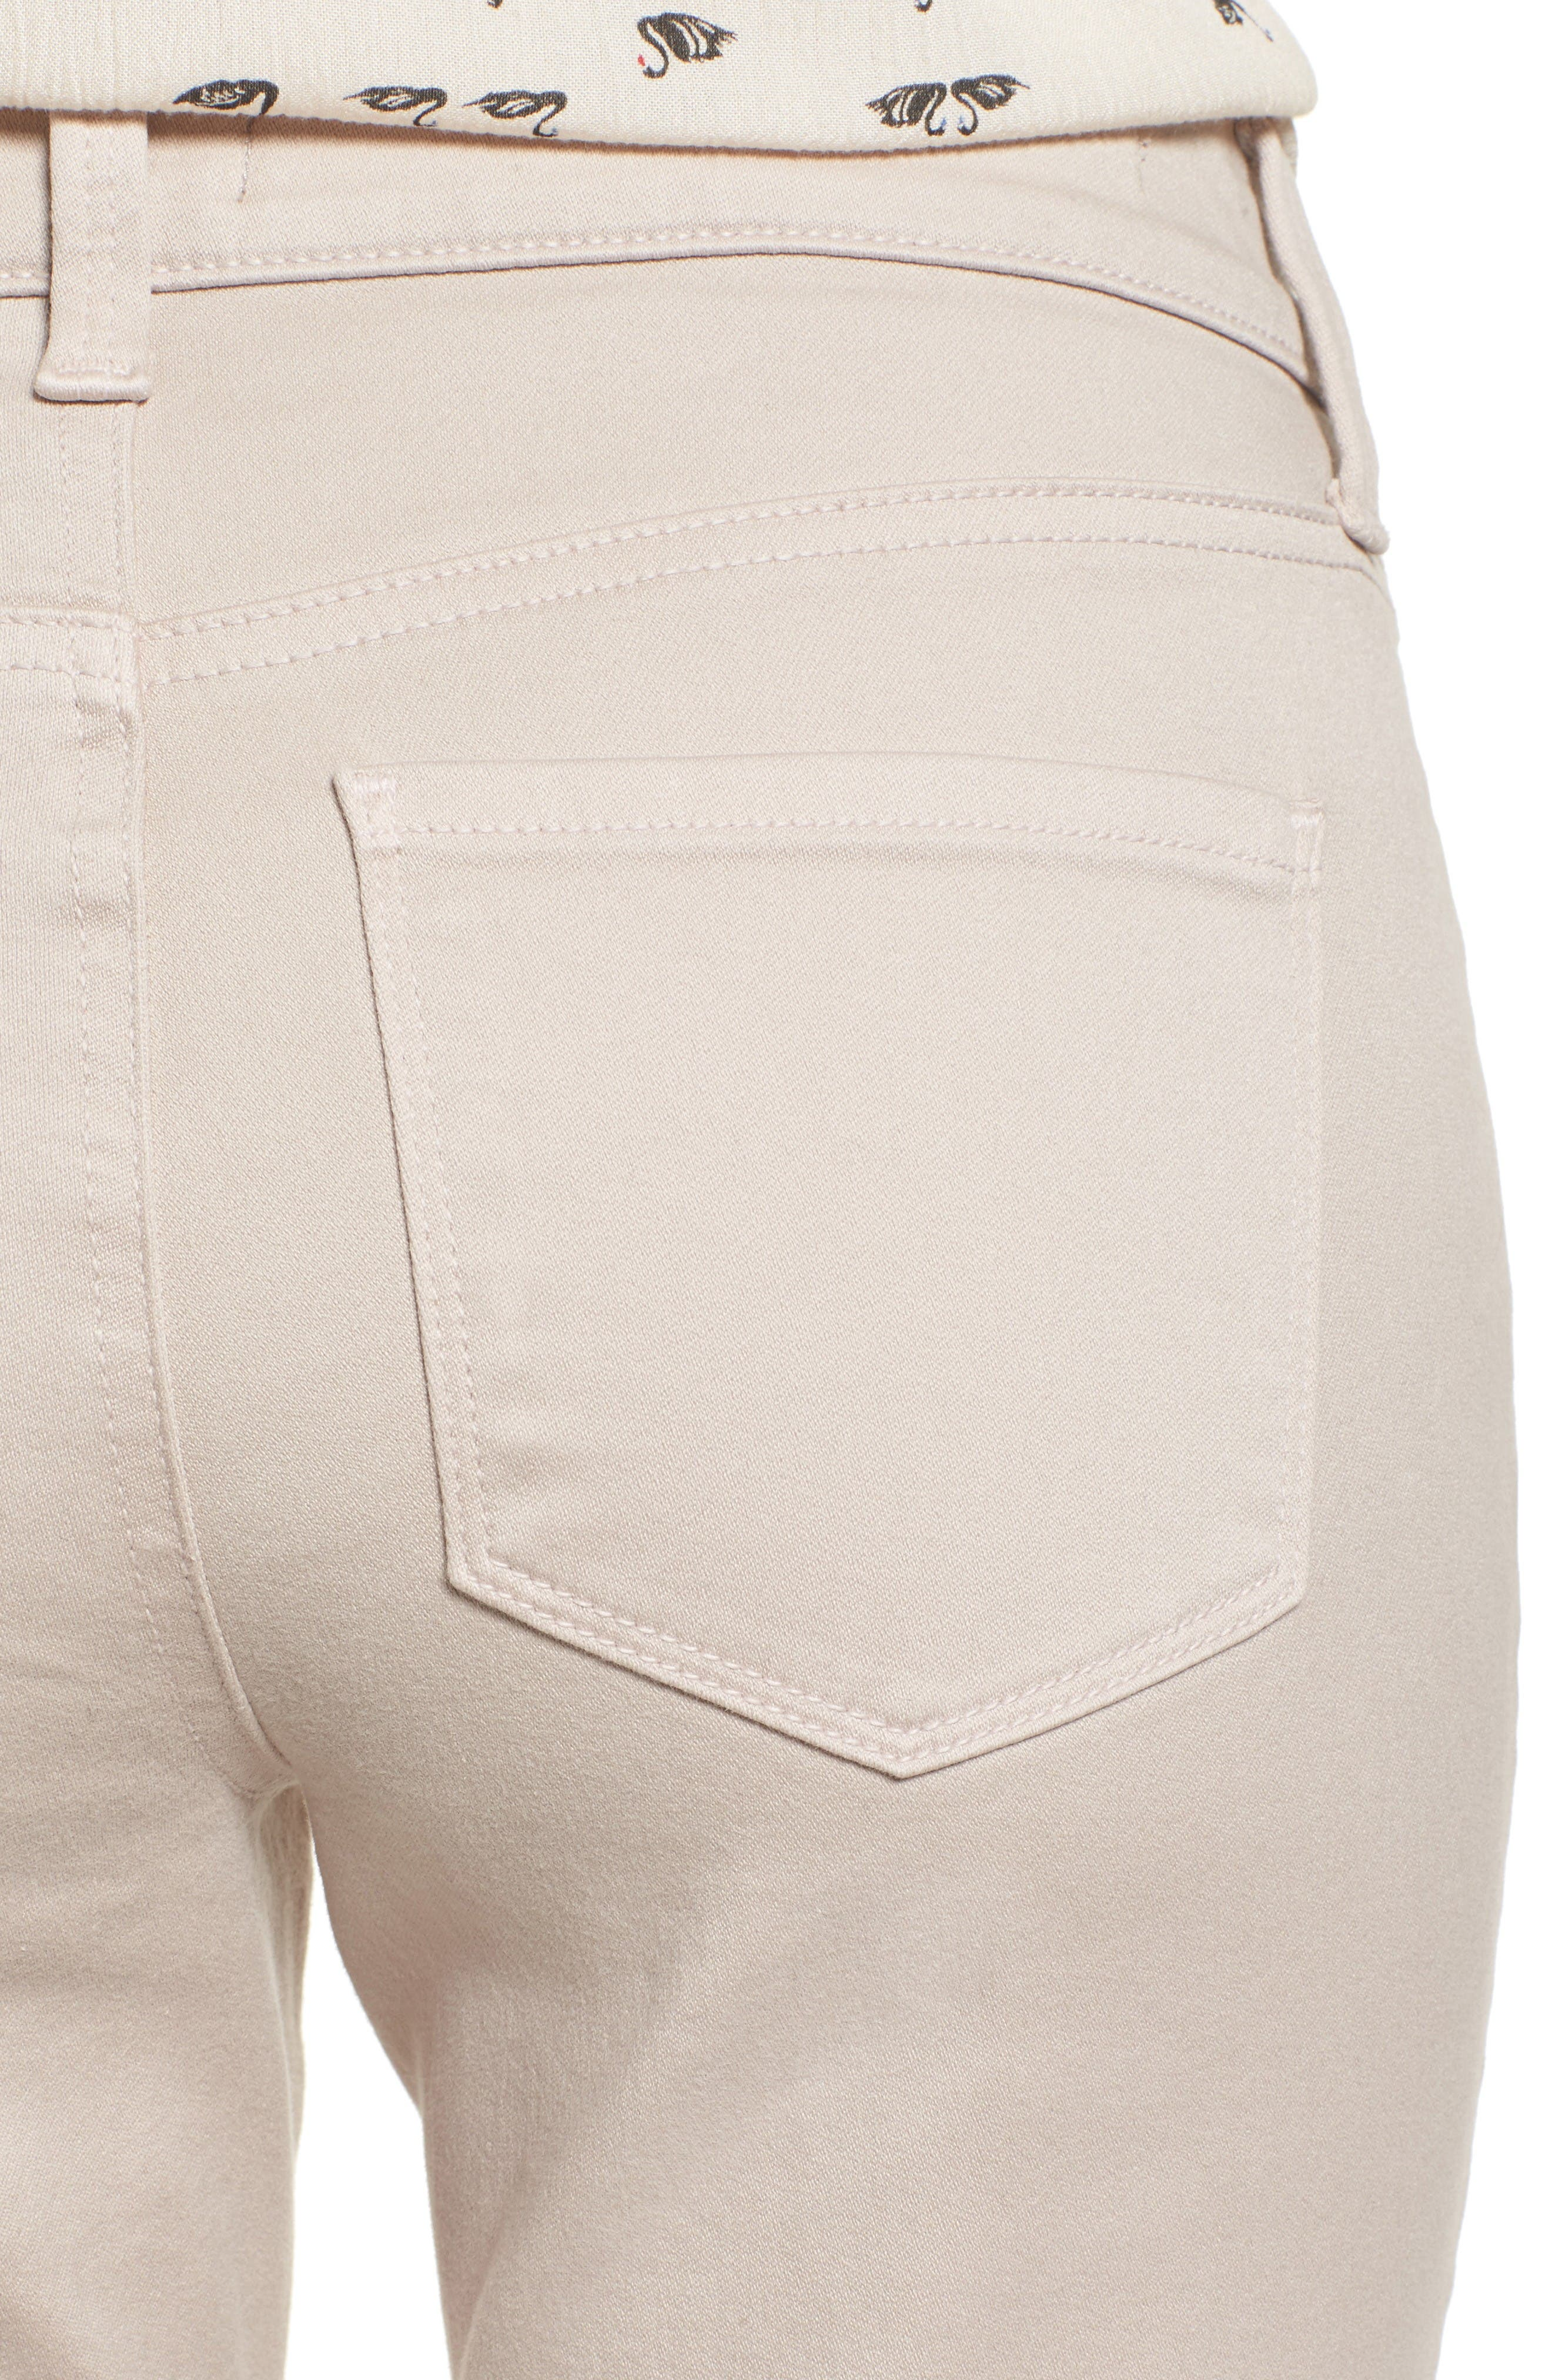 Alternate Image 4  - NYDJ Alina Colored Stretch Skinny Jeans (Regular & Petite)